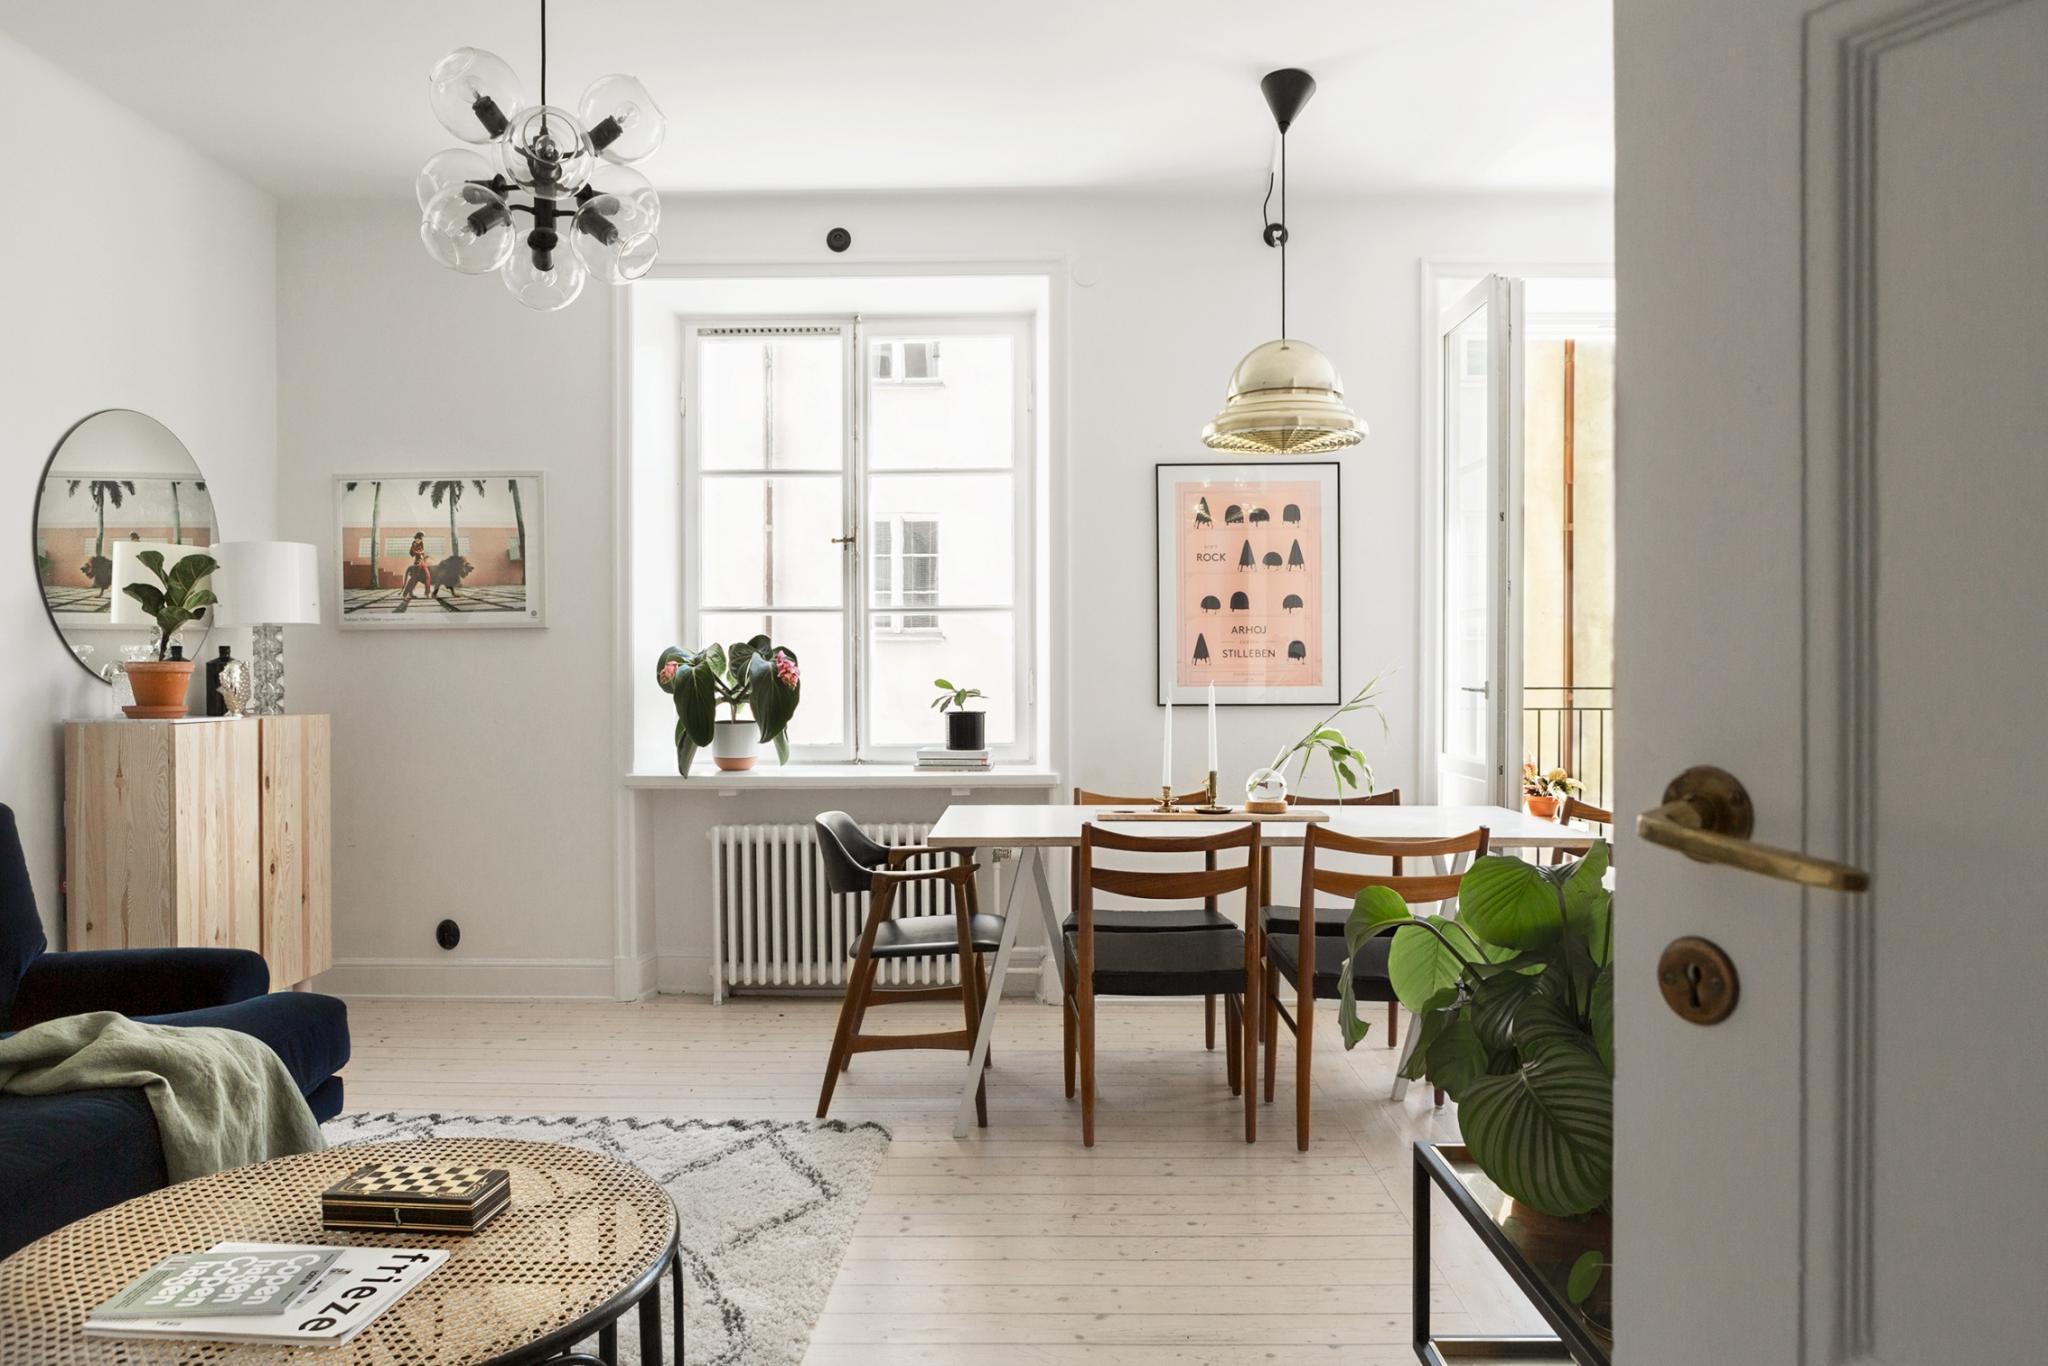 Stue Livingroom Diningroom Spisestue Livingroom Homedecor Boligcious